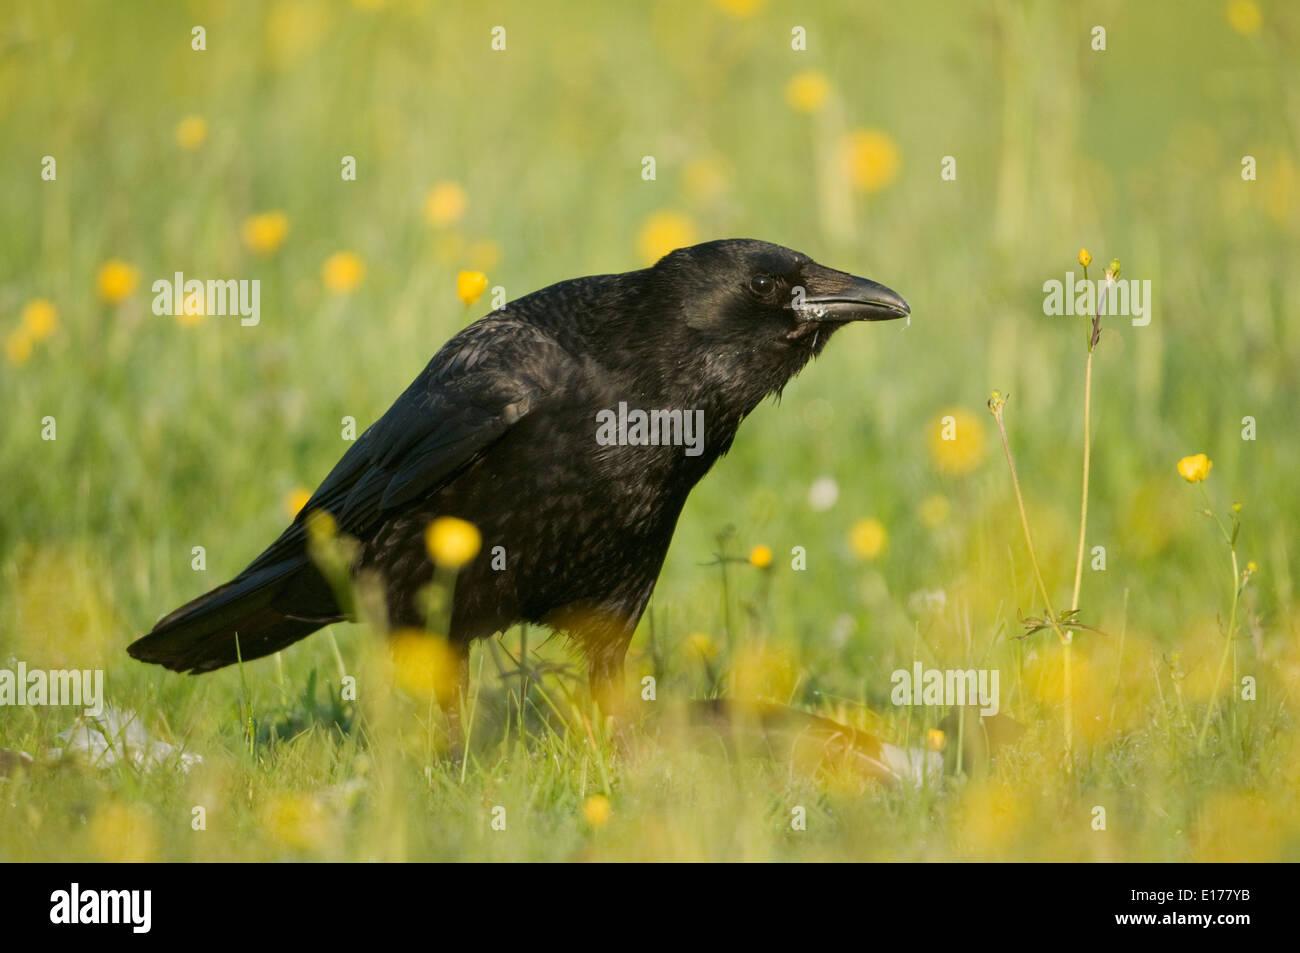 AAS-Krähe (Corvus Corone) in einem Feld von Butterblumen Stockbild